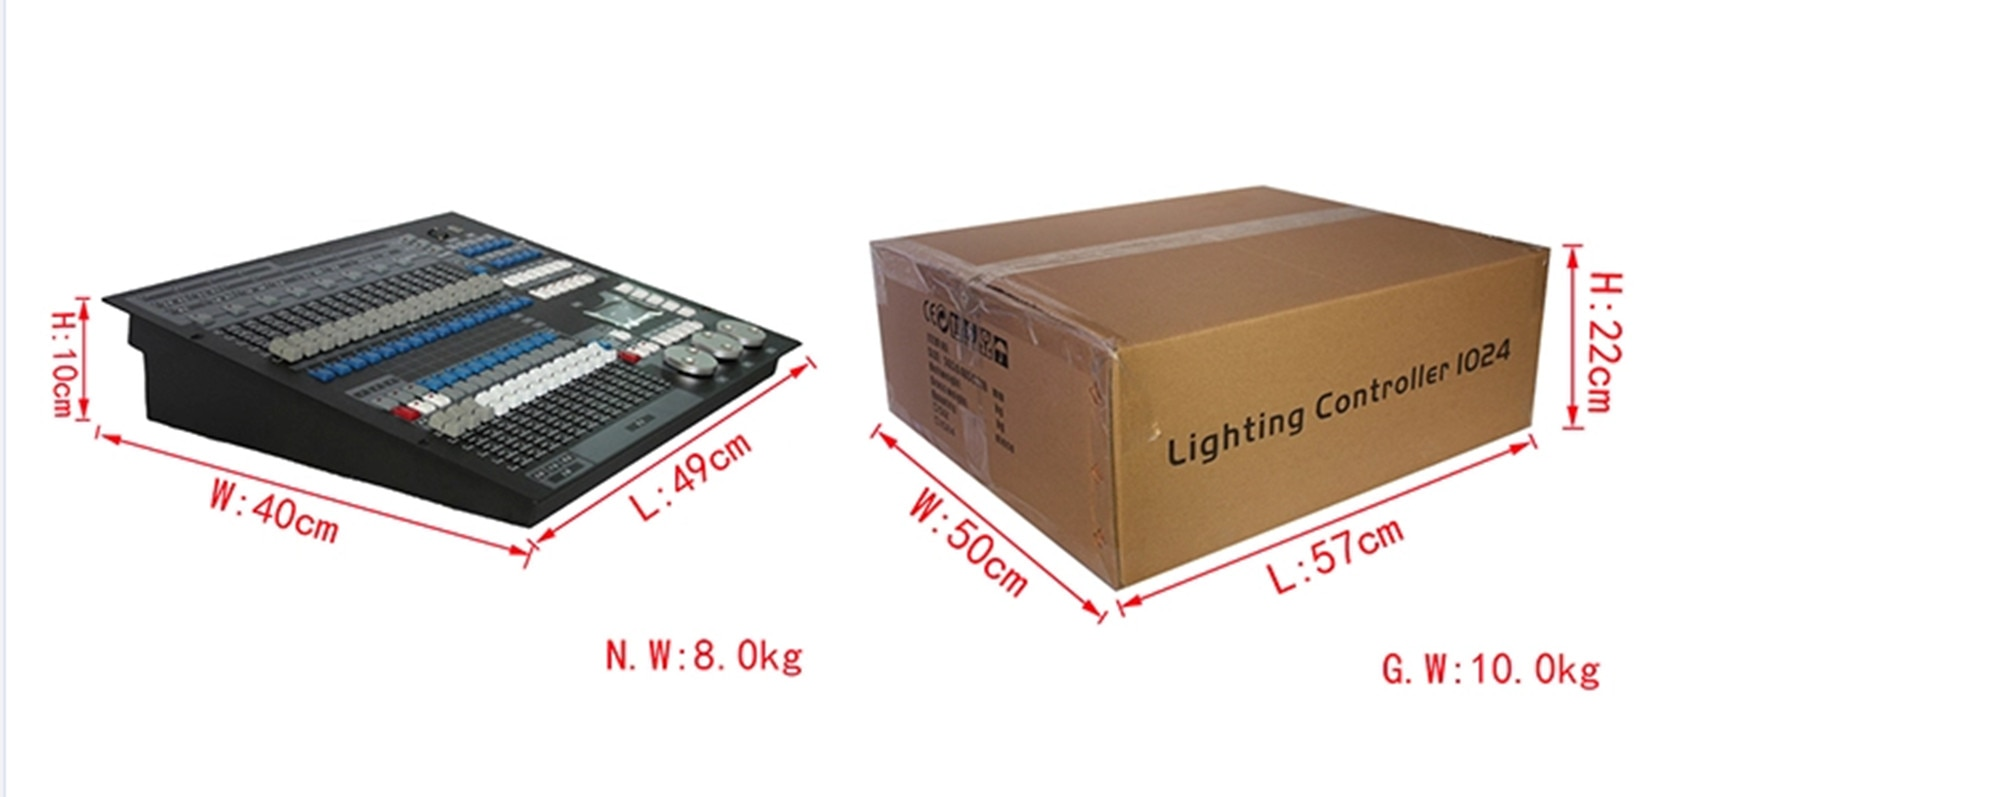 1024 DMX Console With Flight Case DJ Controller Suitable for Moving Head Light Par Light Series Stage Light Equipment